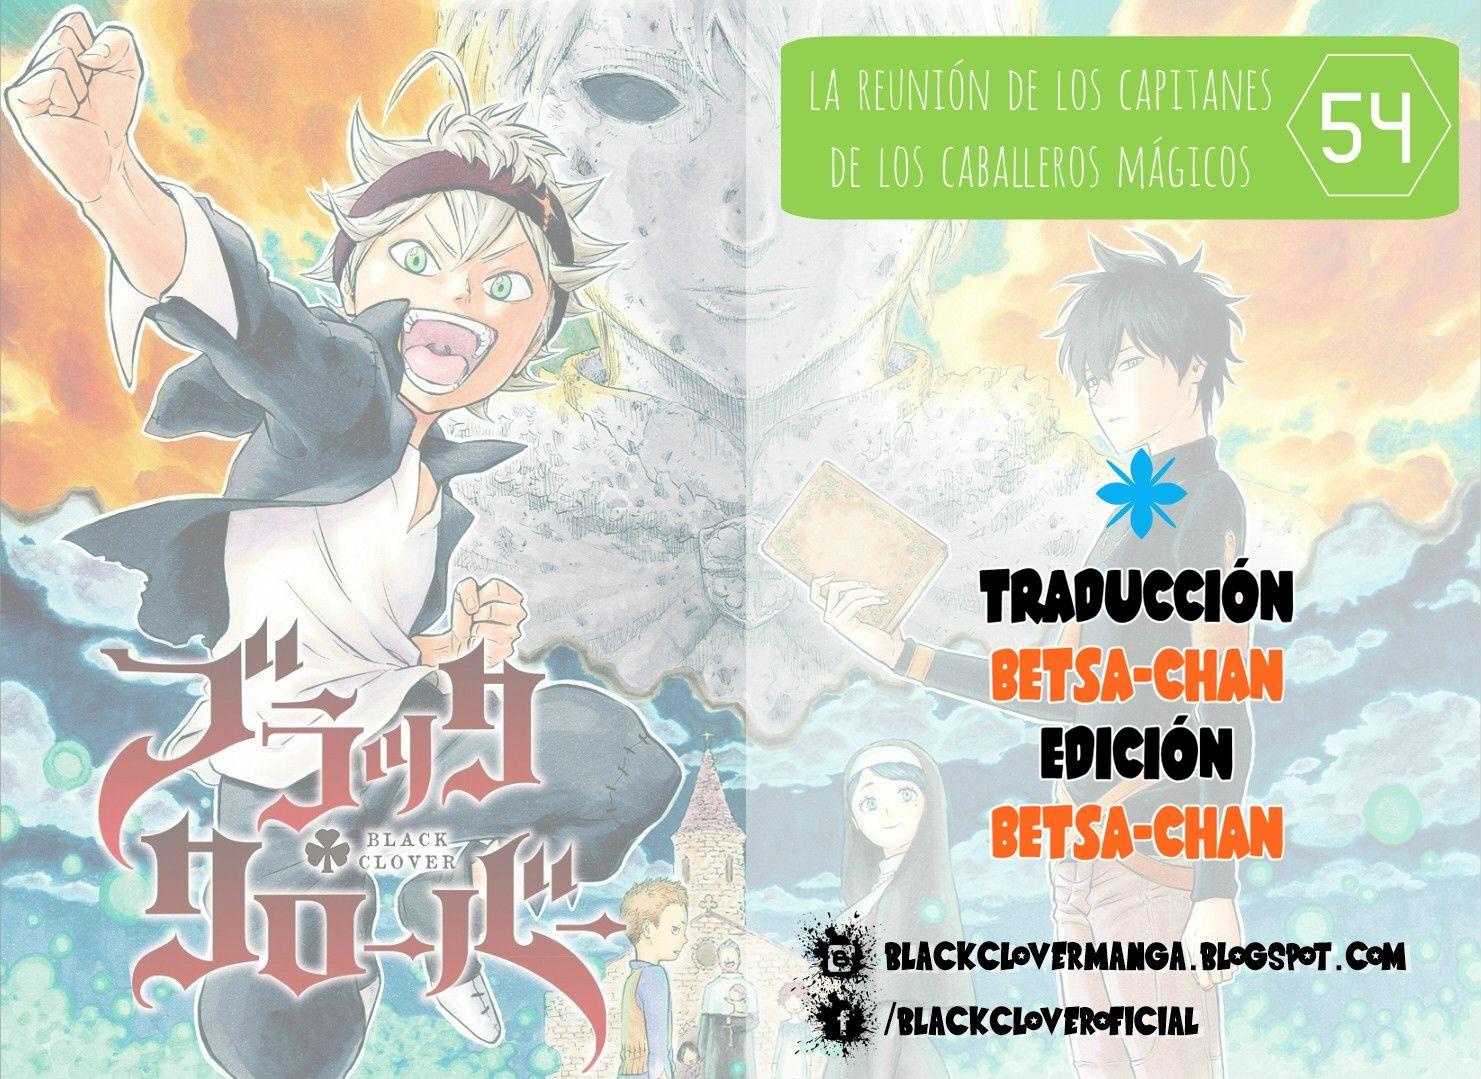 https://c5.ninemanga.com/es_manga/35/3811/459535/2c2264c170f13a15c0a47bfc97eb13fe.jpg Page 1